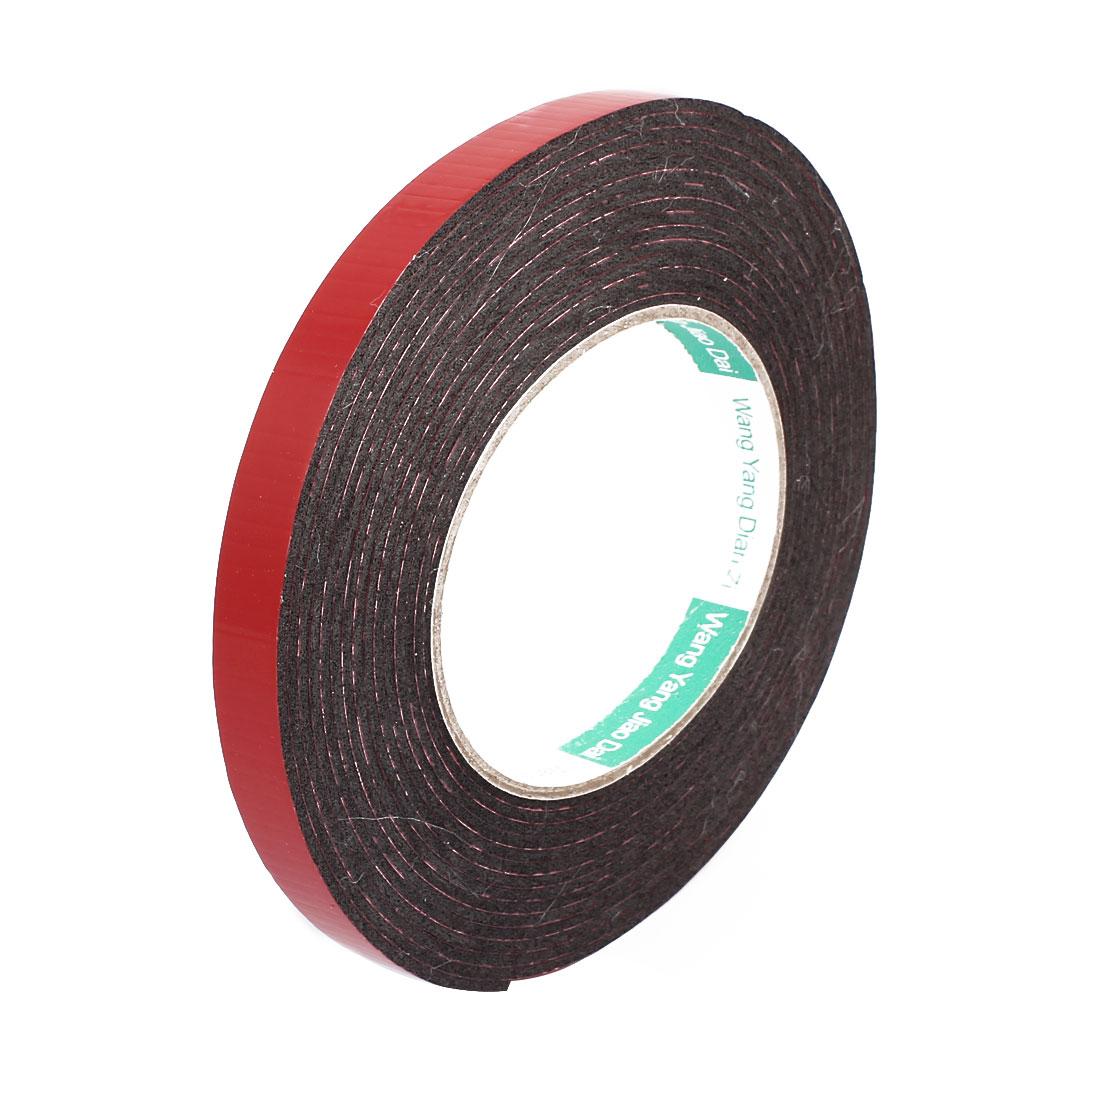 12mm Dual Side Adhesive Shock Resistant Anti-noise Foam Tape 5M Length